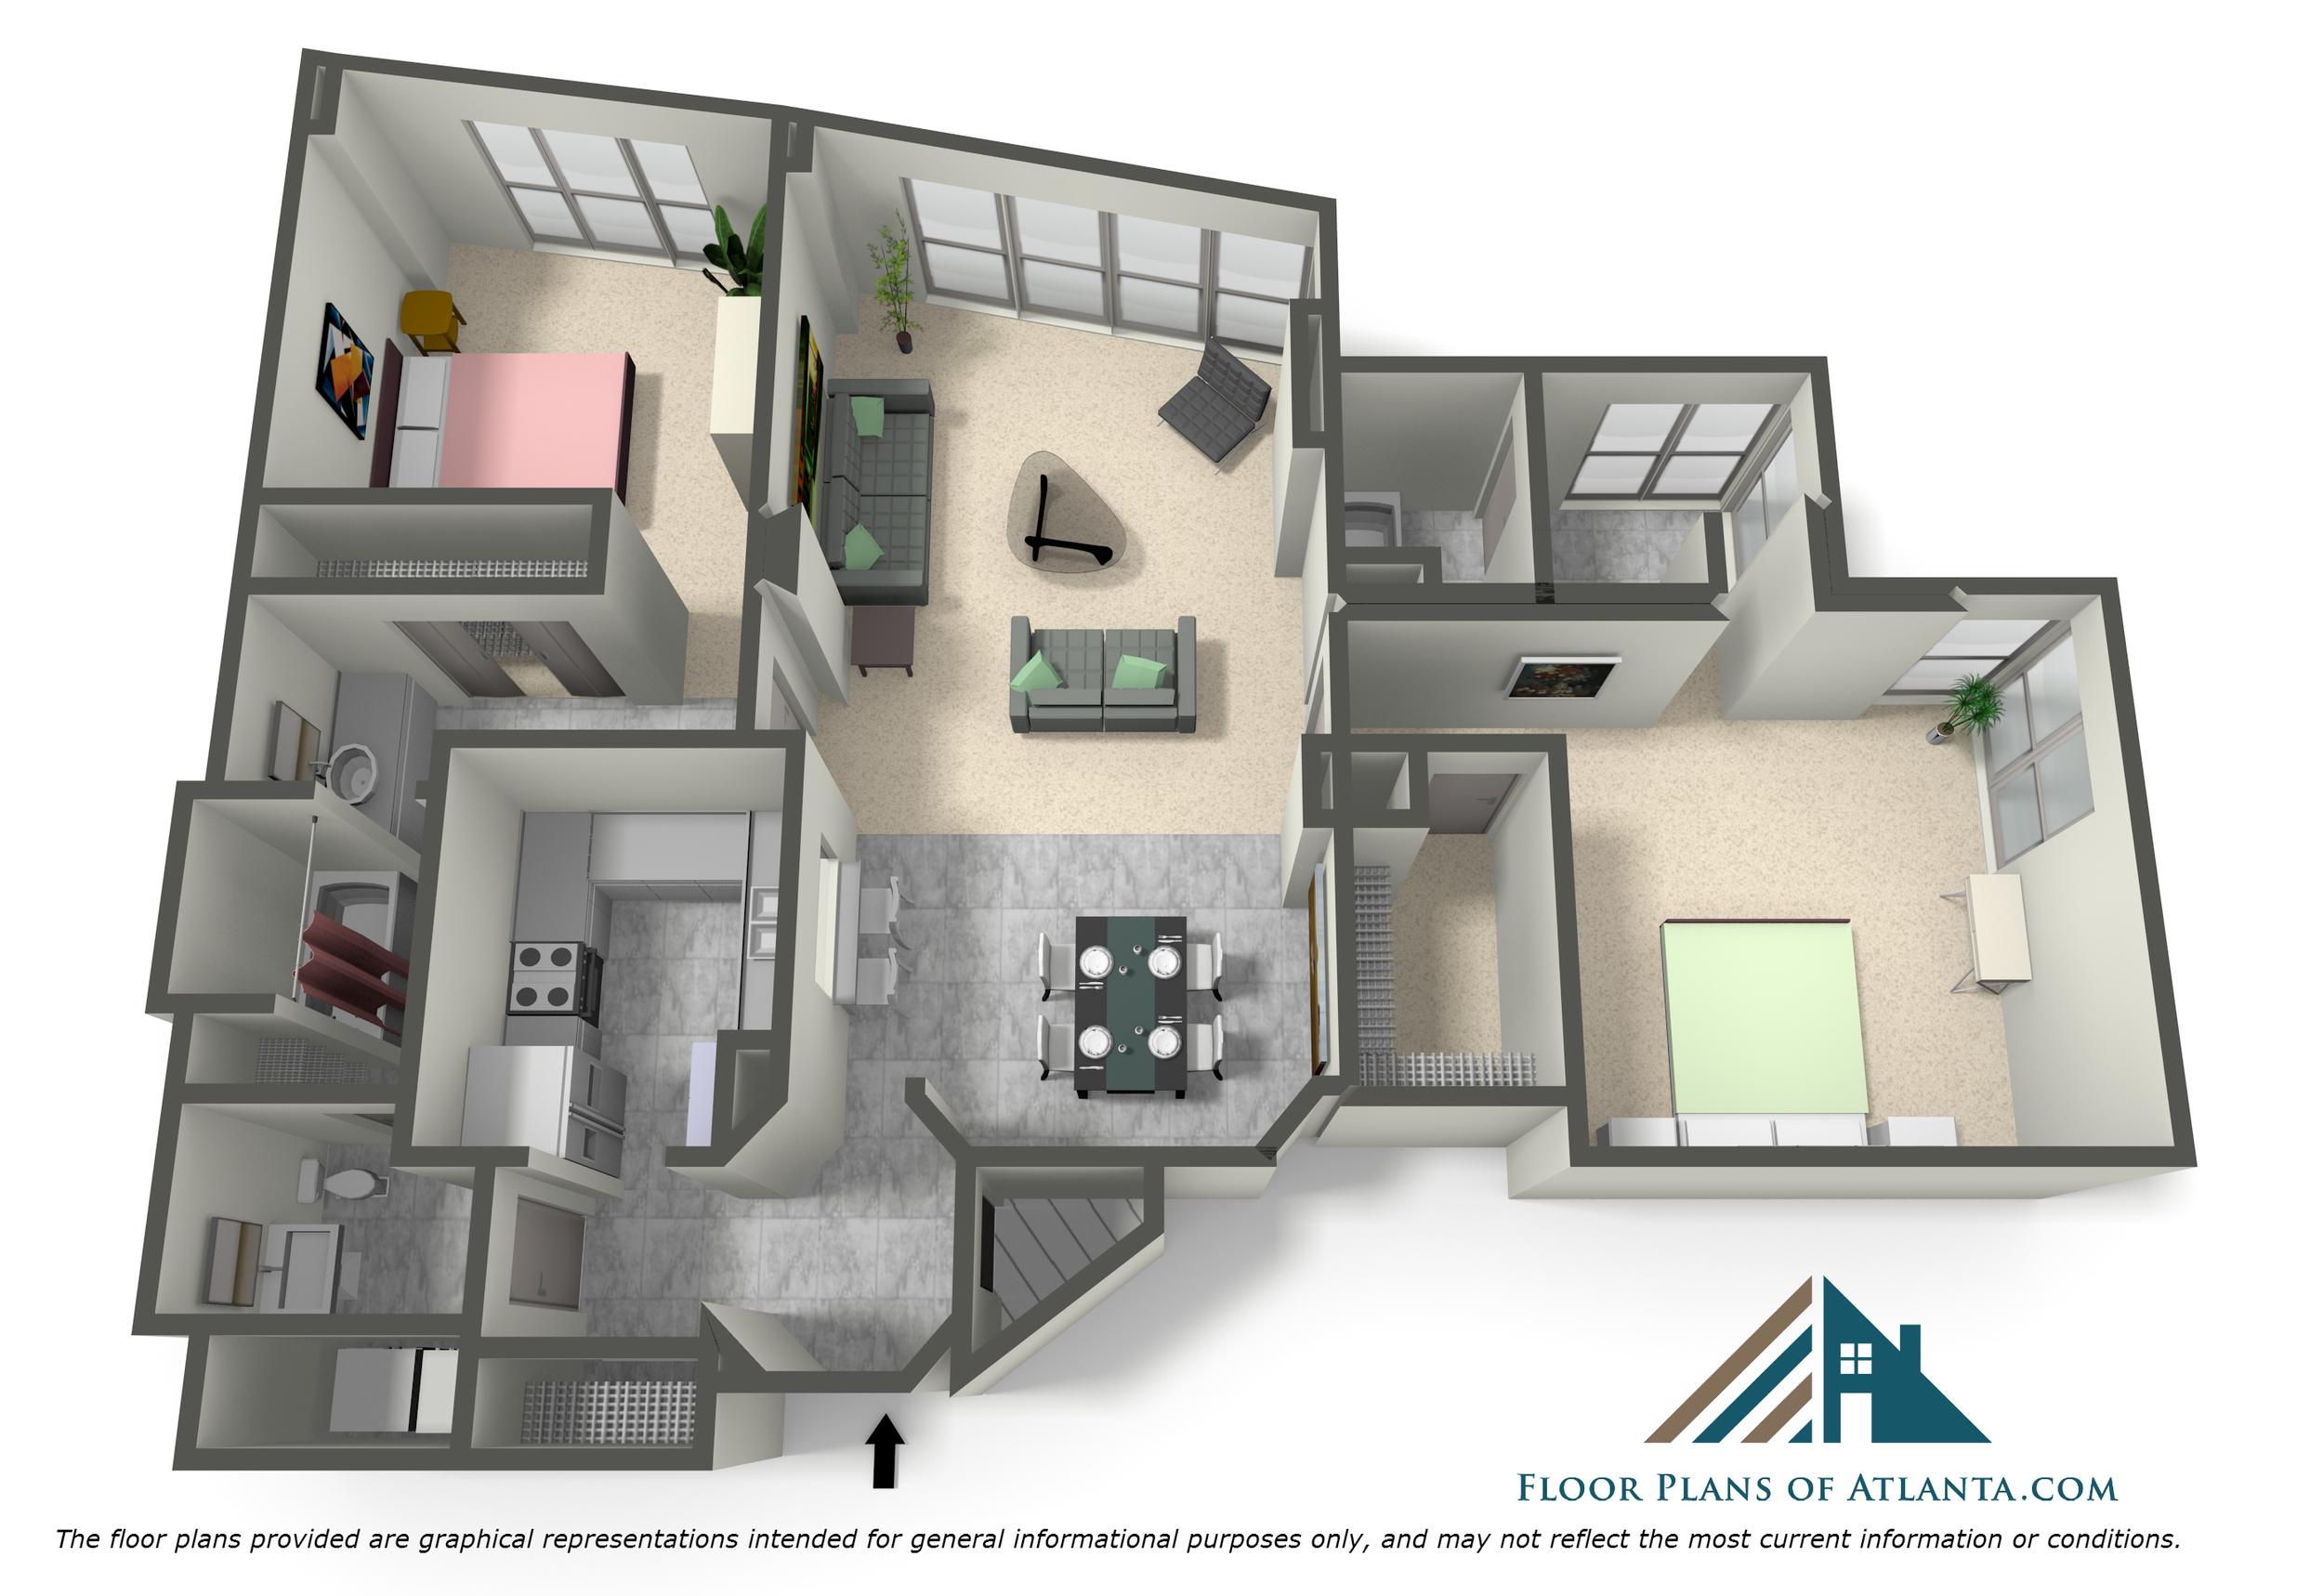 furnishedOaks2 (1).jpg